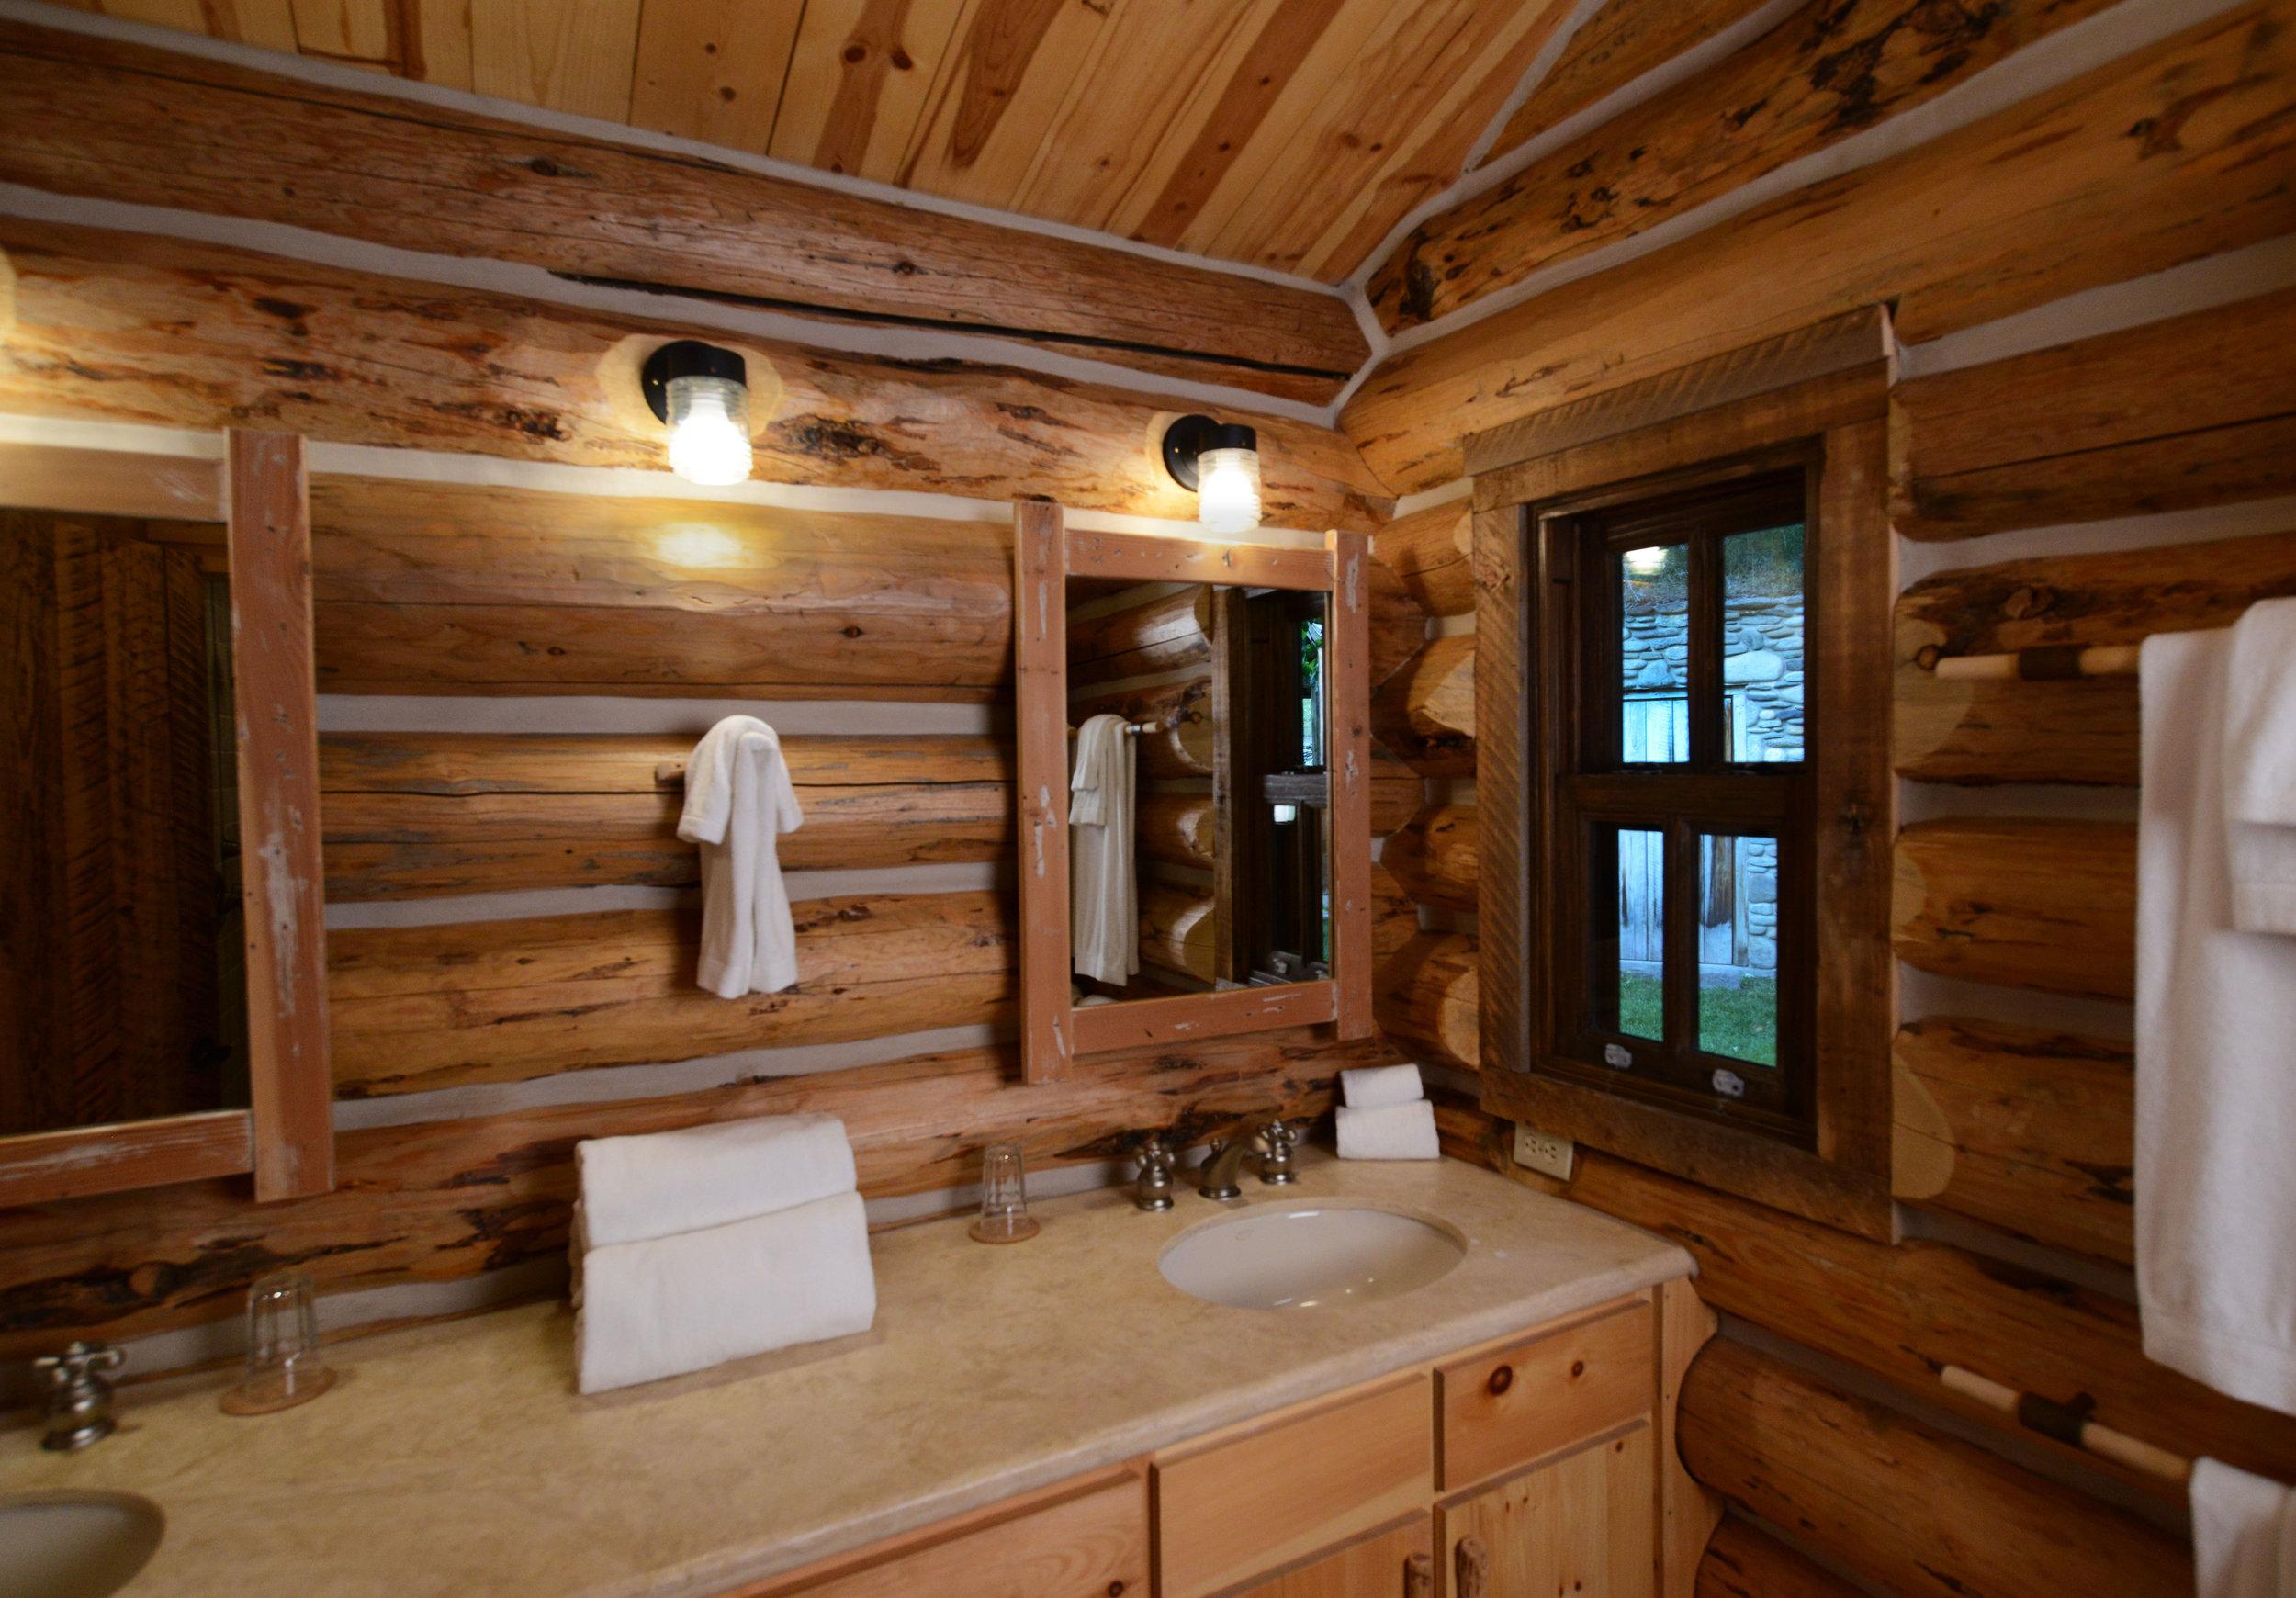 Cabin_1_Bathroom_Windows.jpg